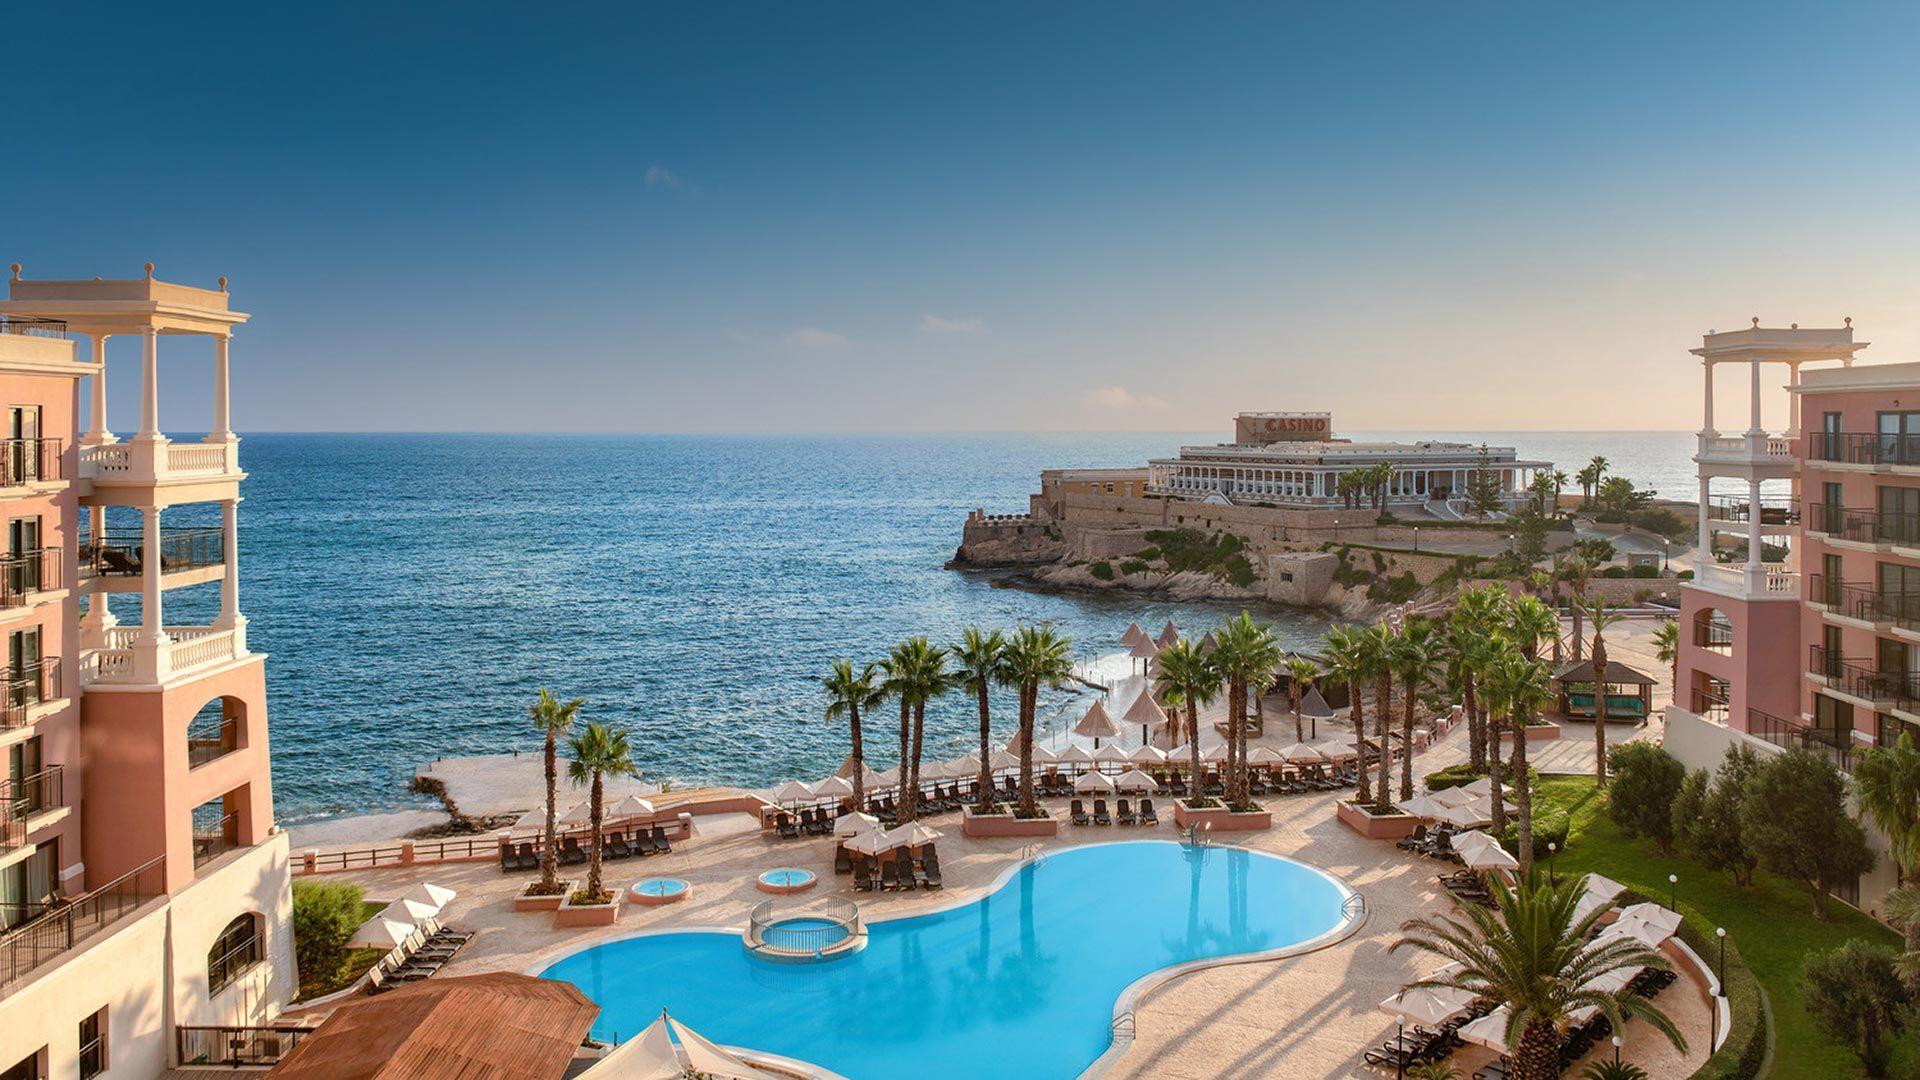 ocean-side exterior of the Westin Dragonara Resort in Malta